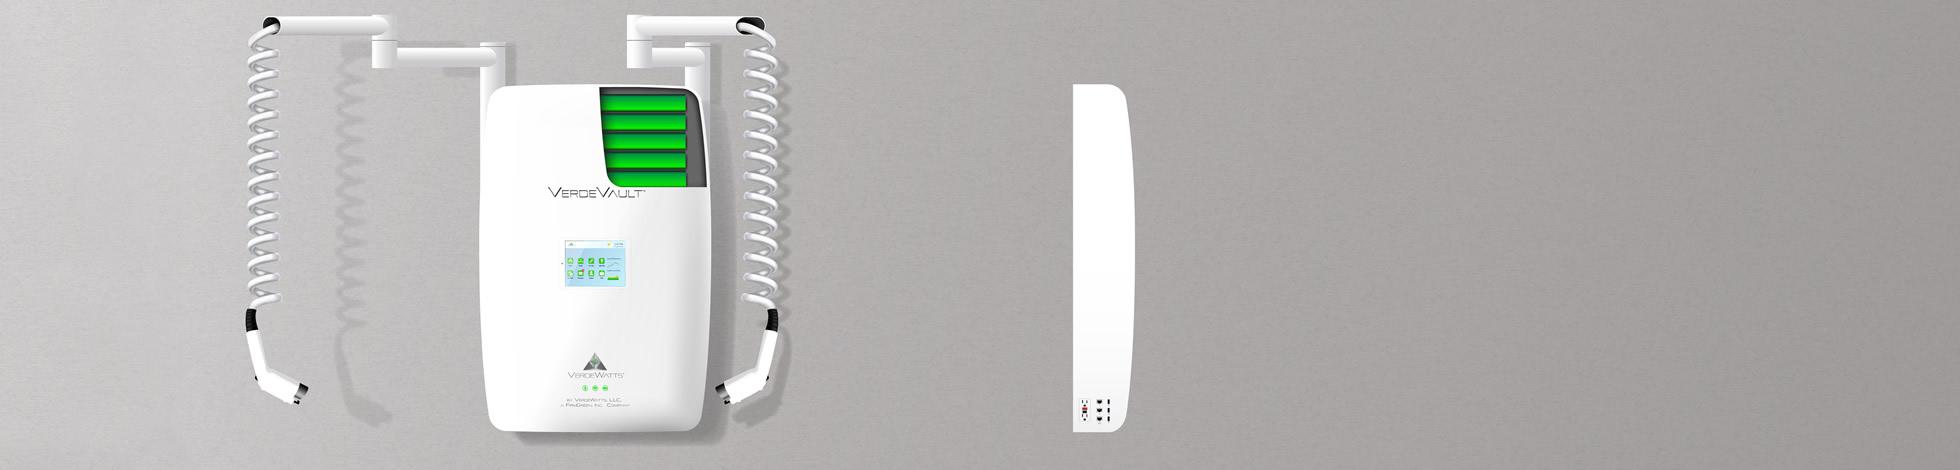 VerdeVault™ cutaway view & side view